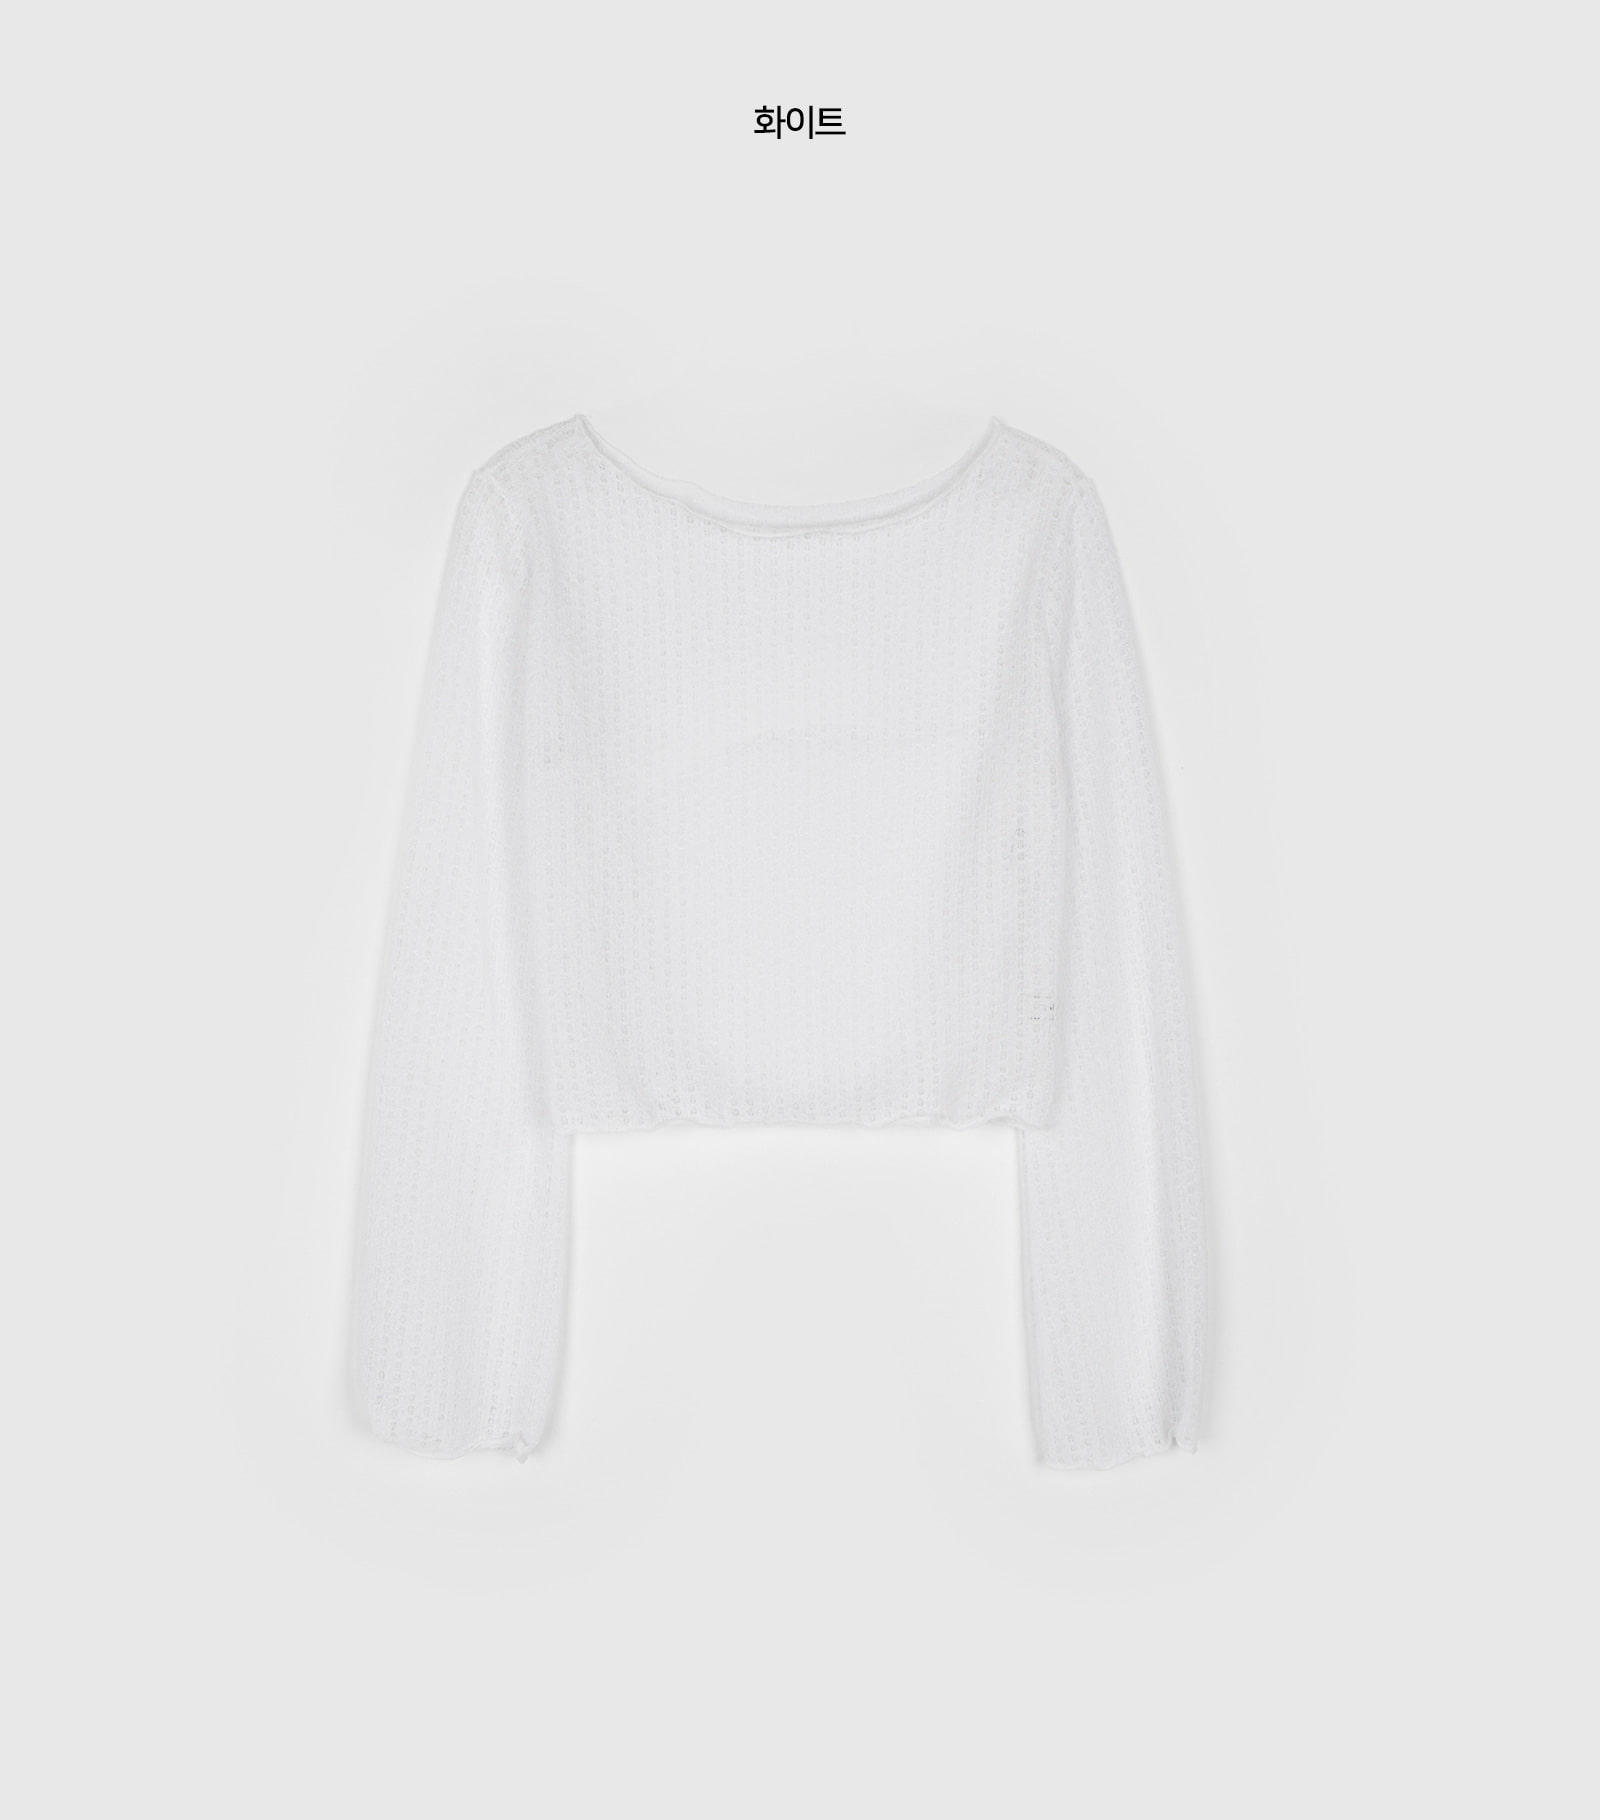 Way Punching Line Linen Wide Round Neck T-Shirt